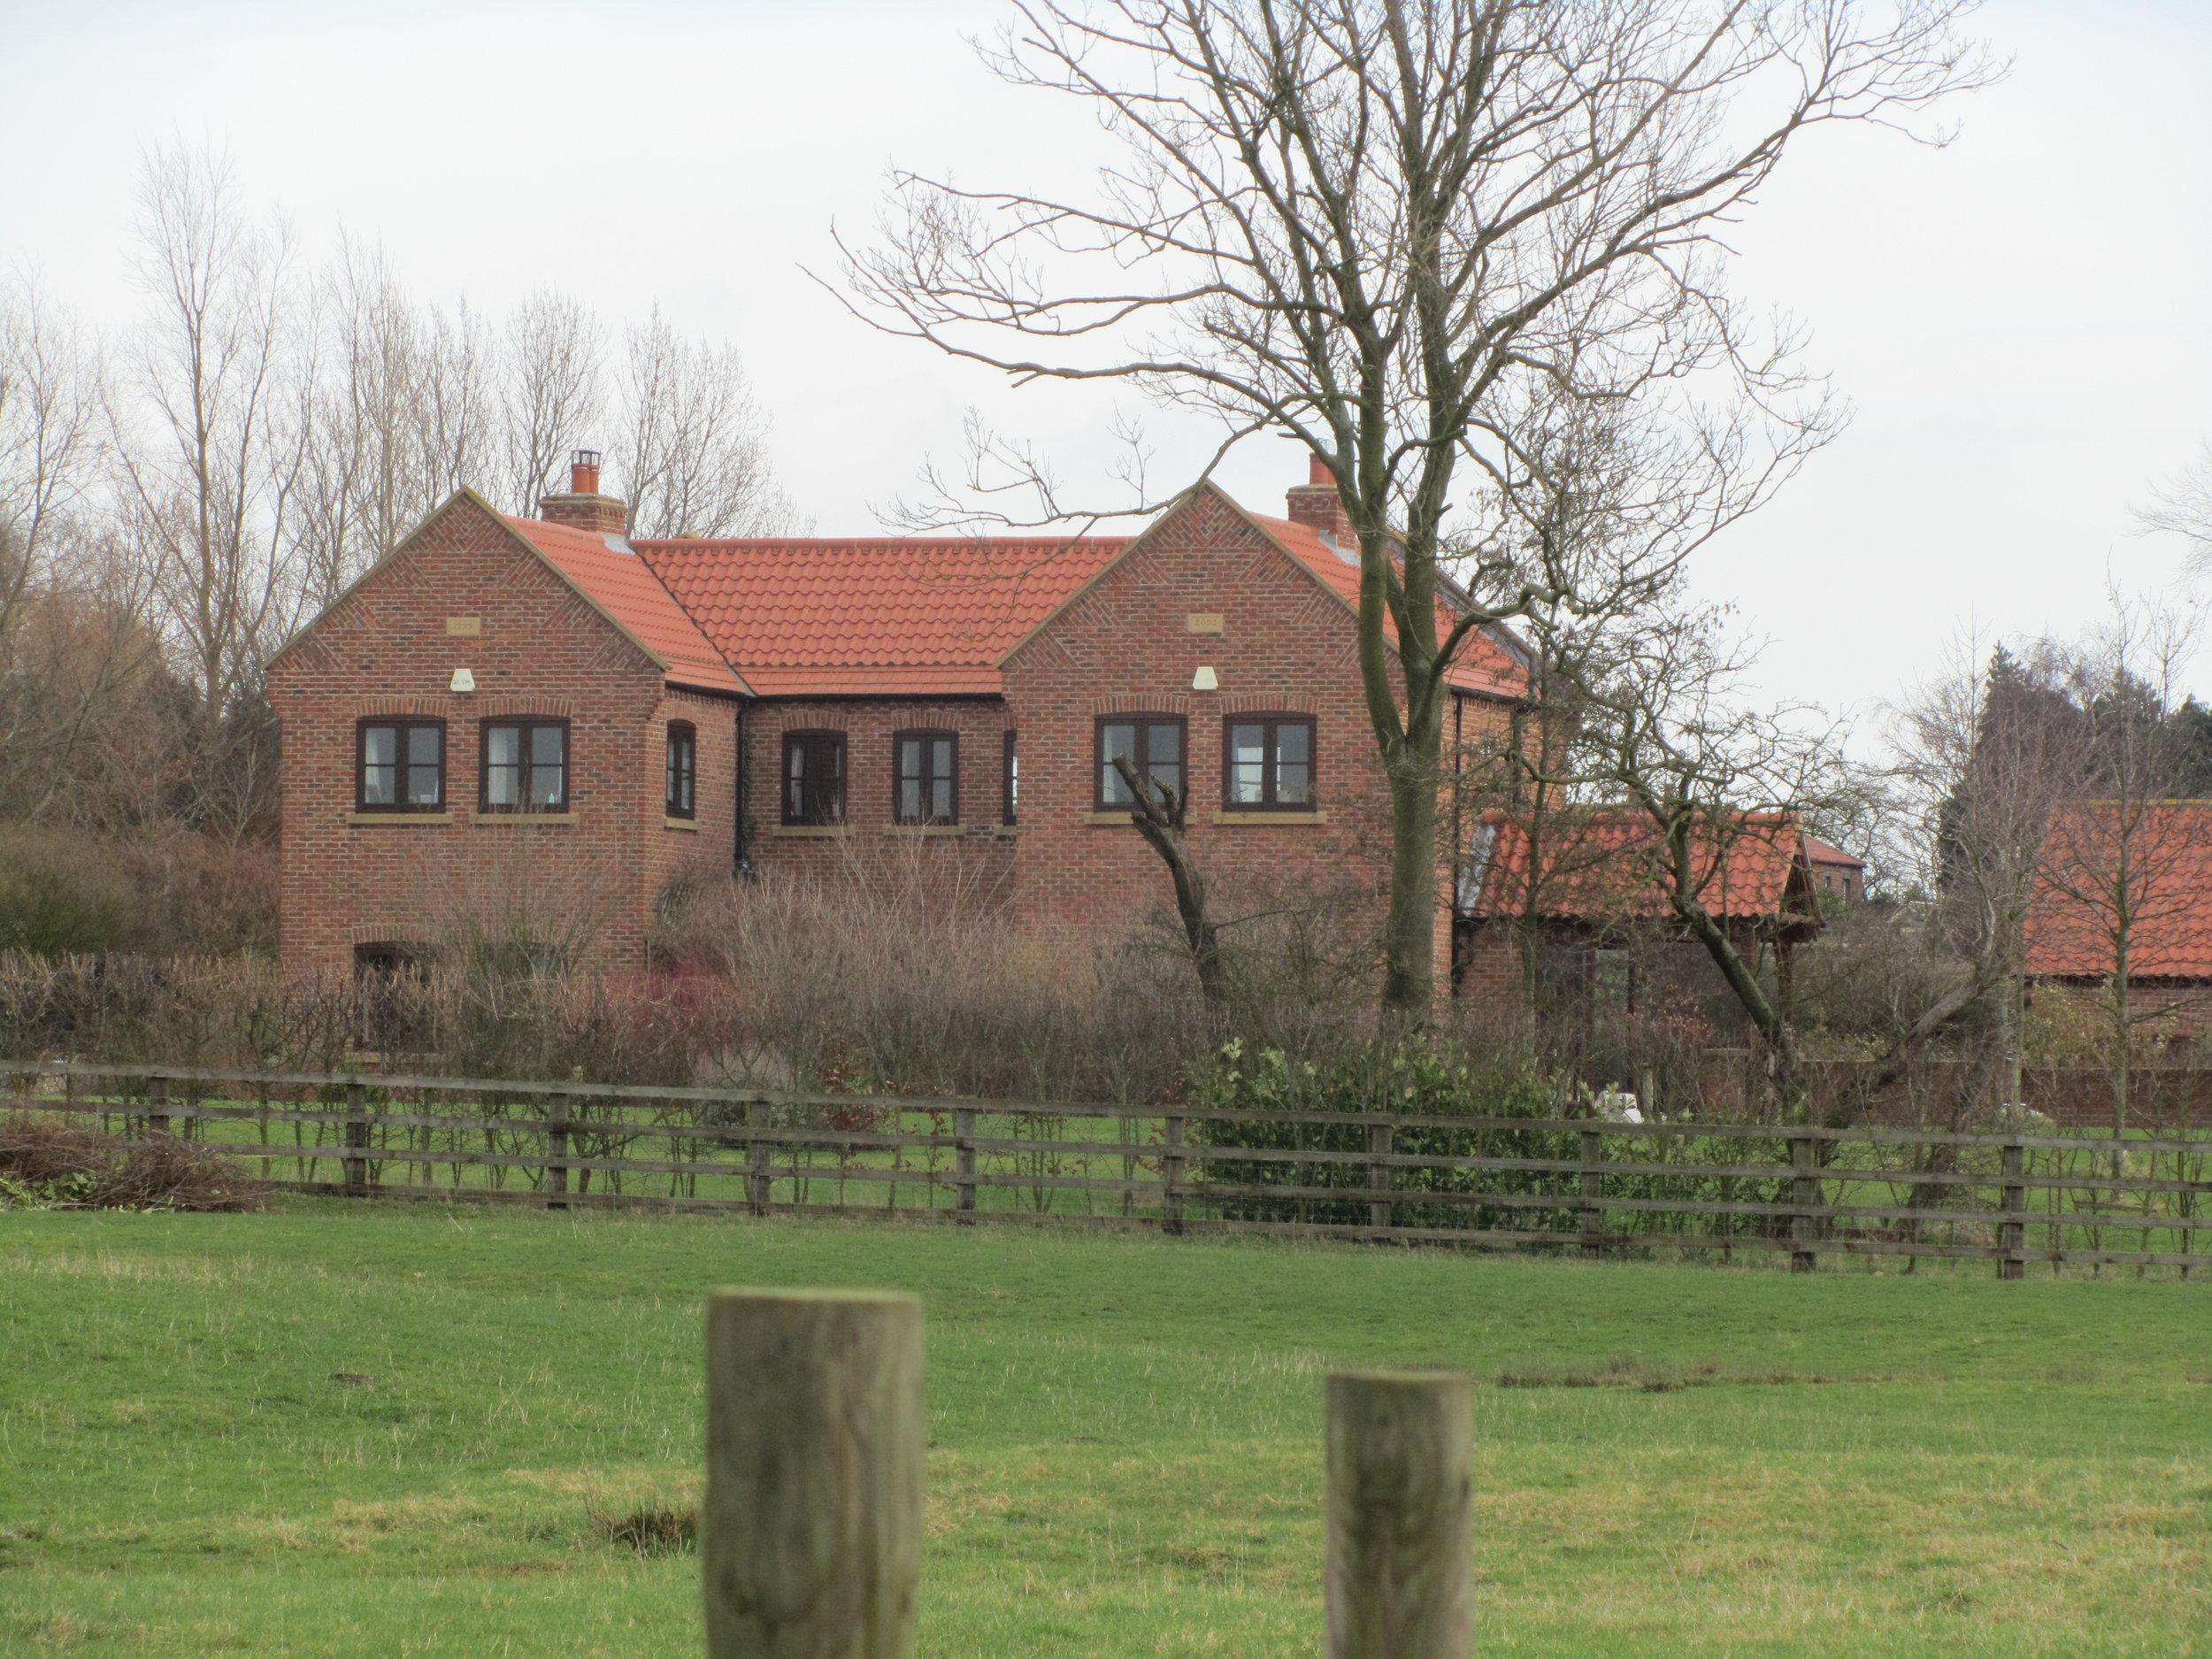 Exterior 3 - North End Farm - East Yorkshire Architects - Samuel Kendall Associates